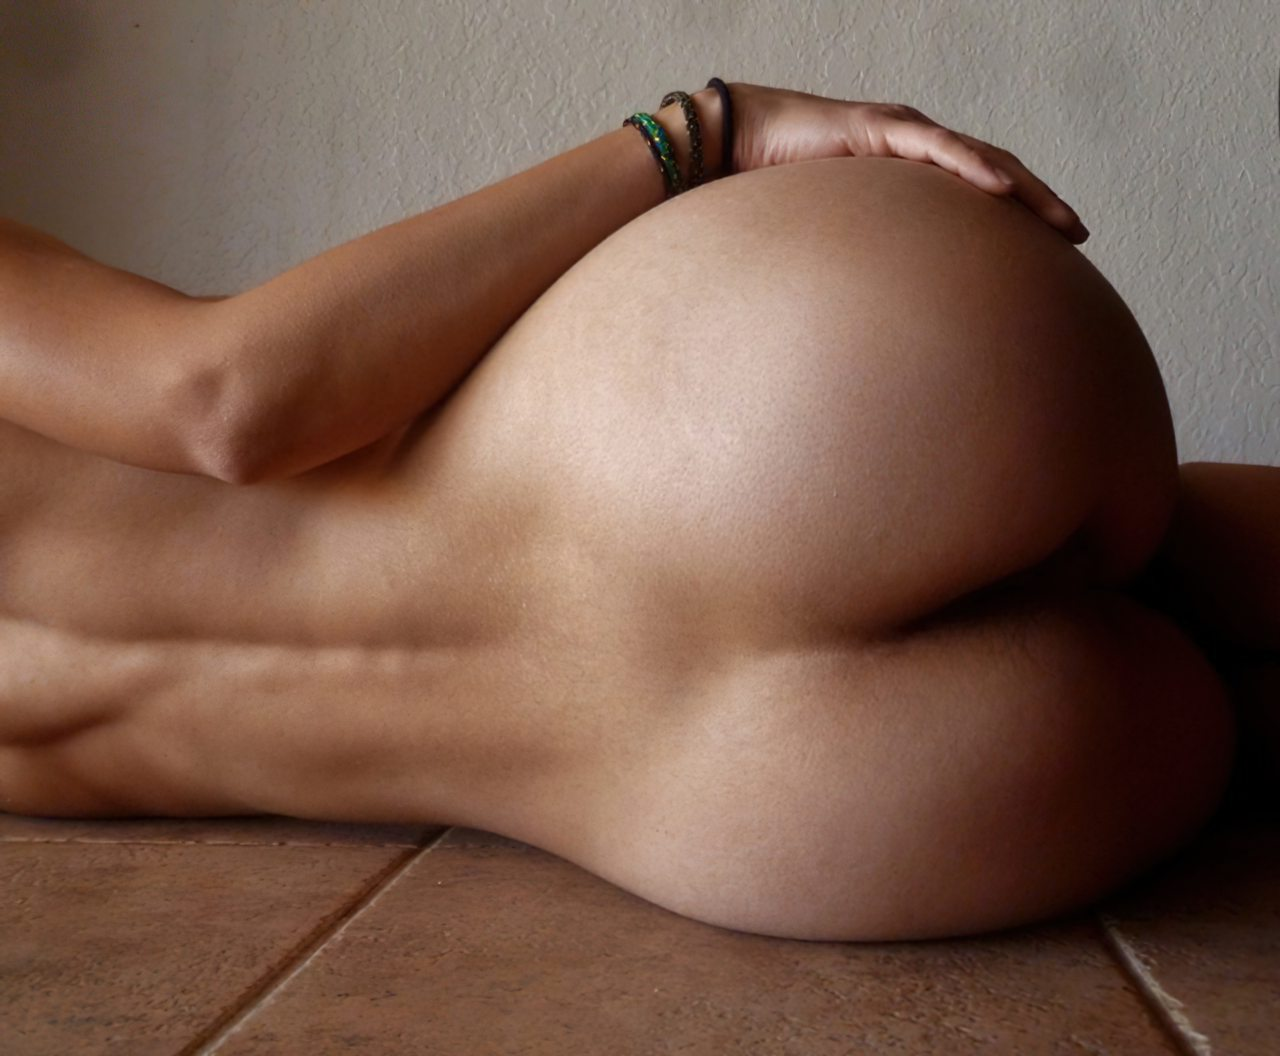 Fotos de Mulheres Nuas (28)